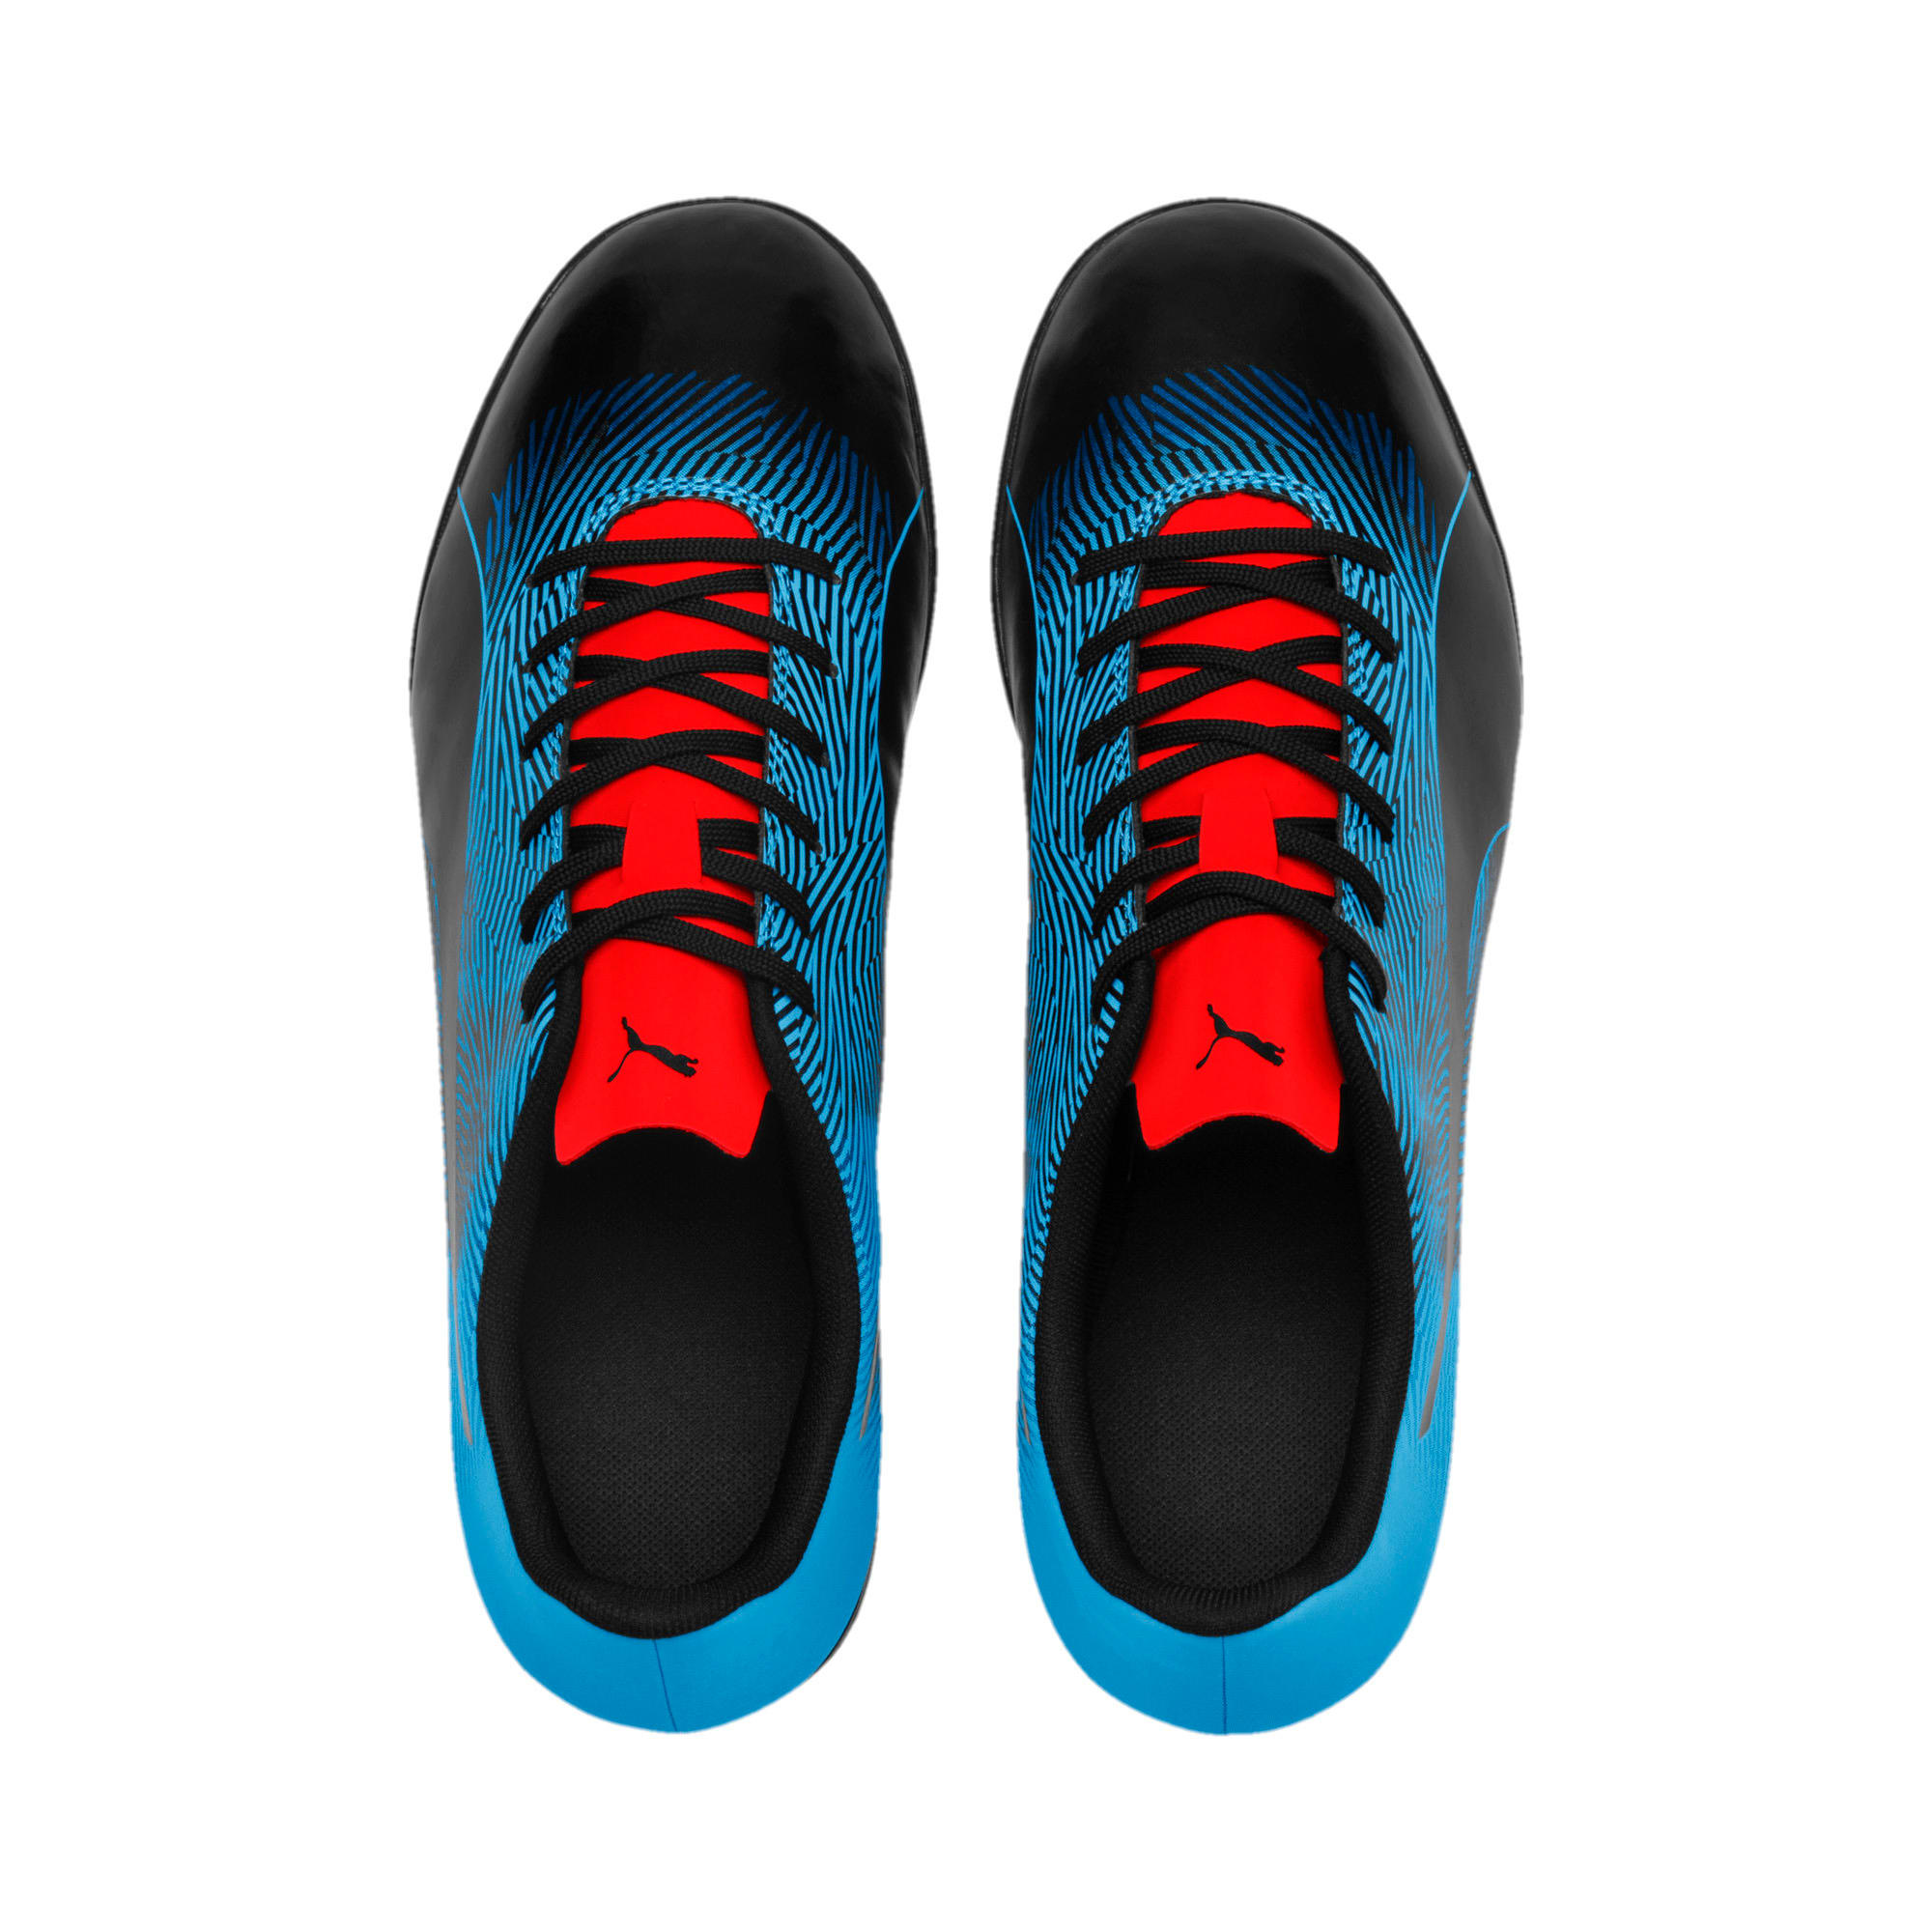 Thumbnail 6 of PUMA Spirit II TT Men's Soccer Shoes, Black-Bleu Azur-Red Blast, medium